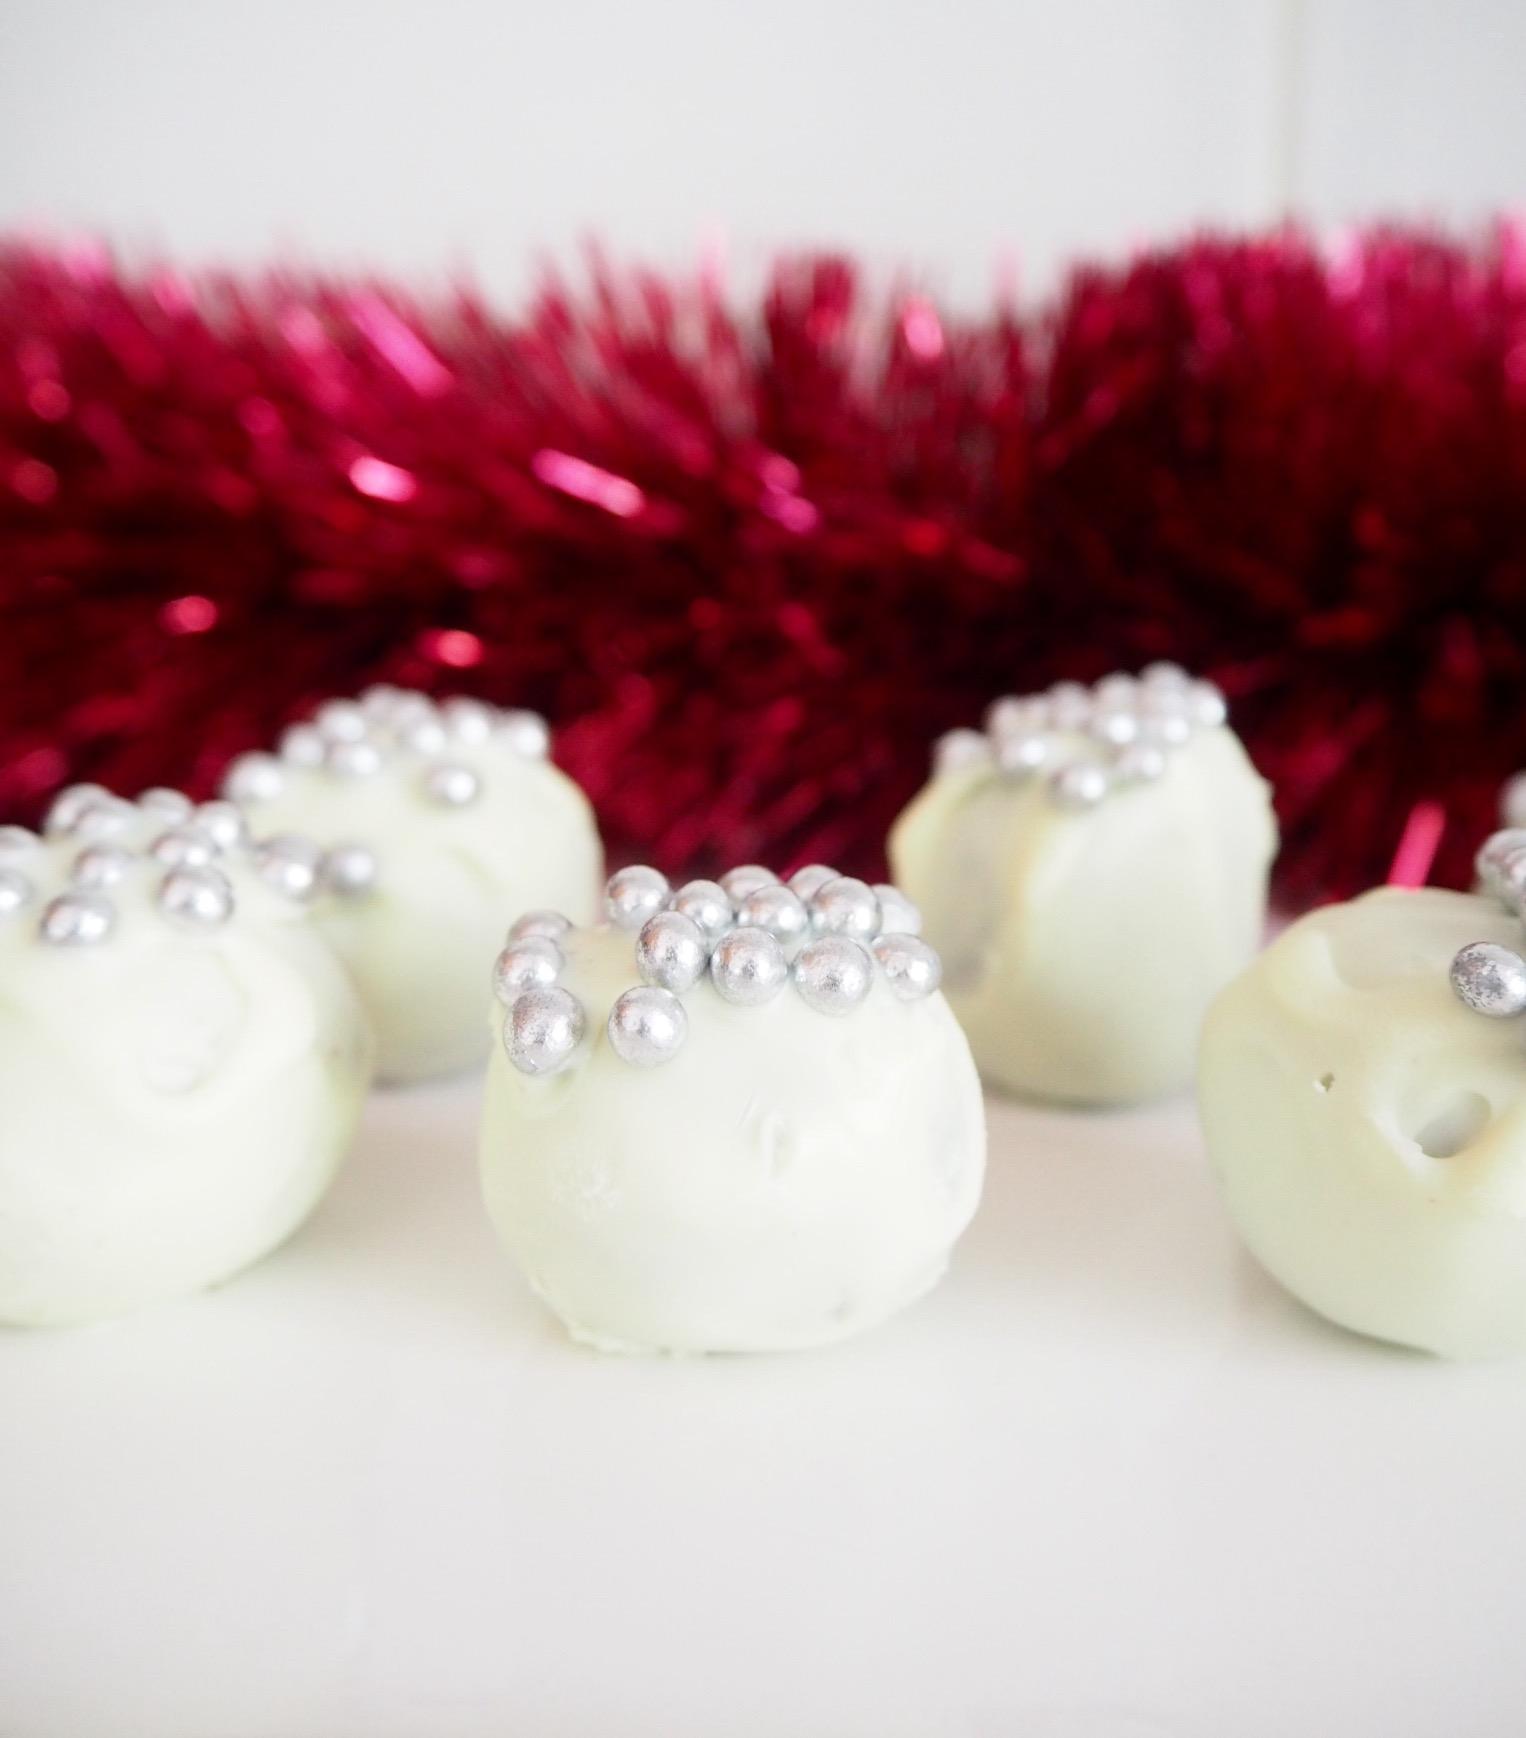 Three Ingredient Oreo Truffle Balls